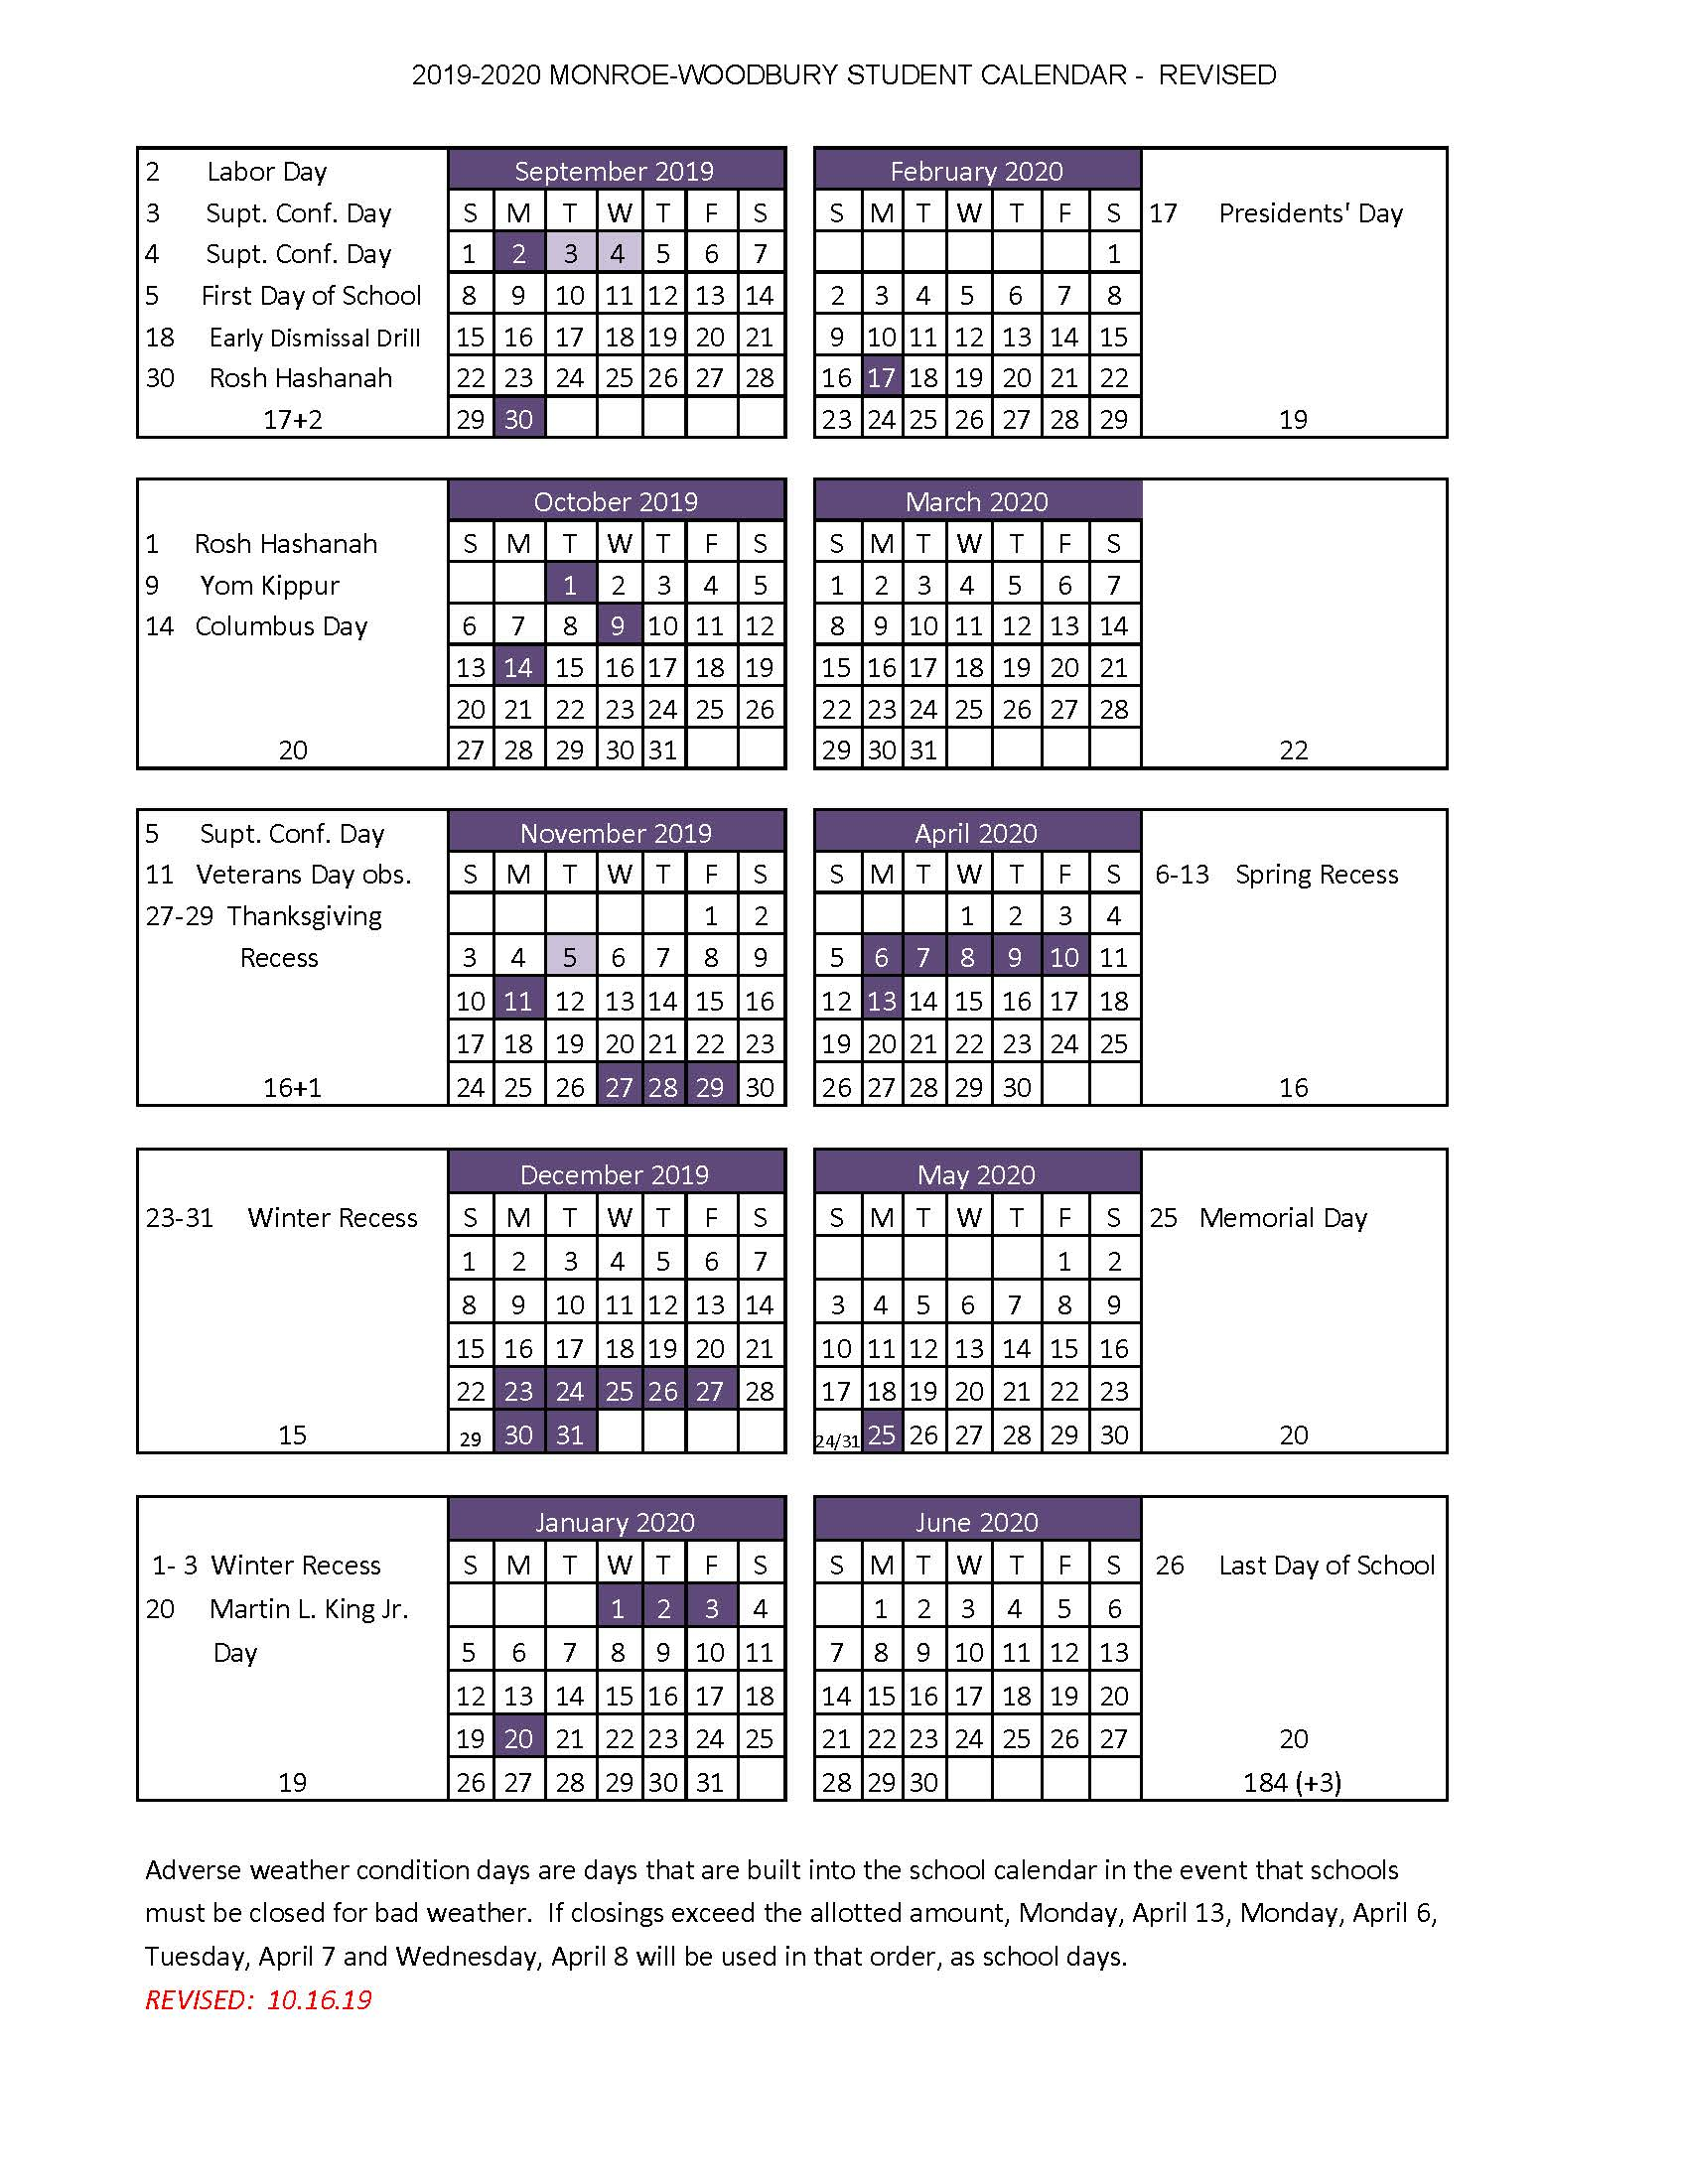 High School Handbook - Monroe-Woodbury Central School pertaining to Bedford Central School Calendar